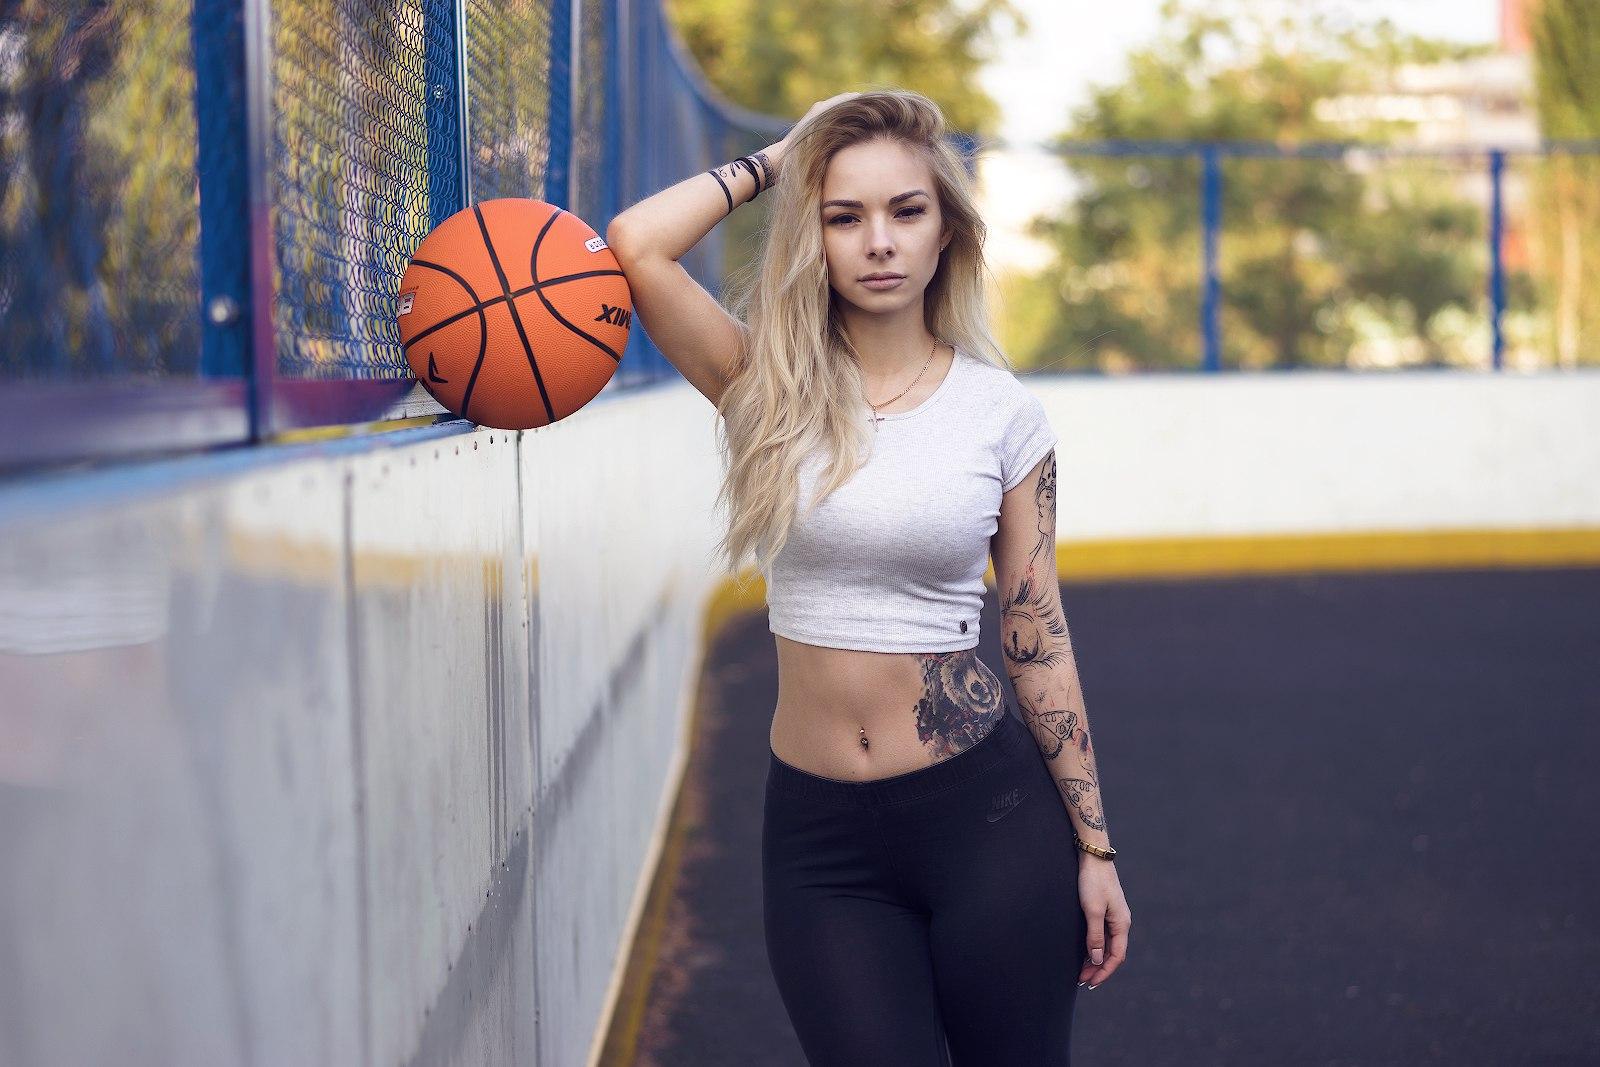 wallpaper : blonde, ball, yoga pants, belly, pierced navel, portrait